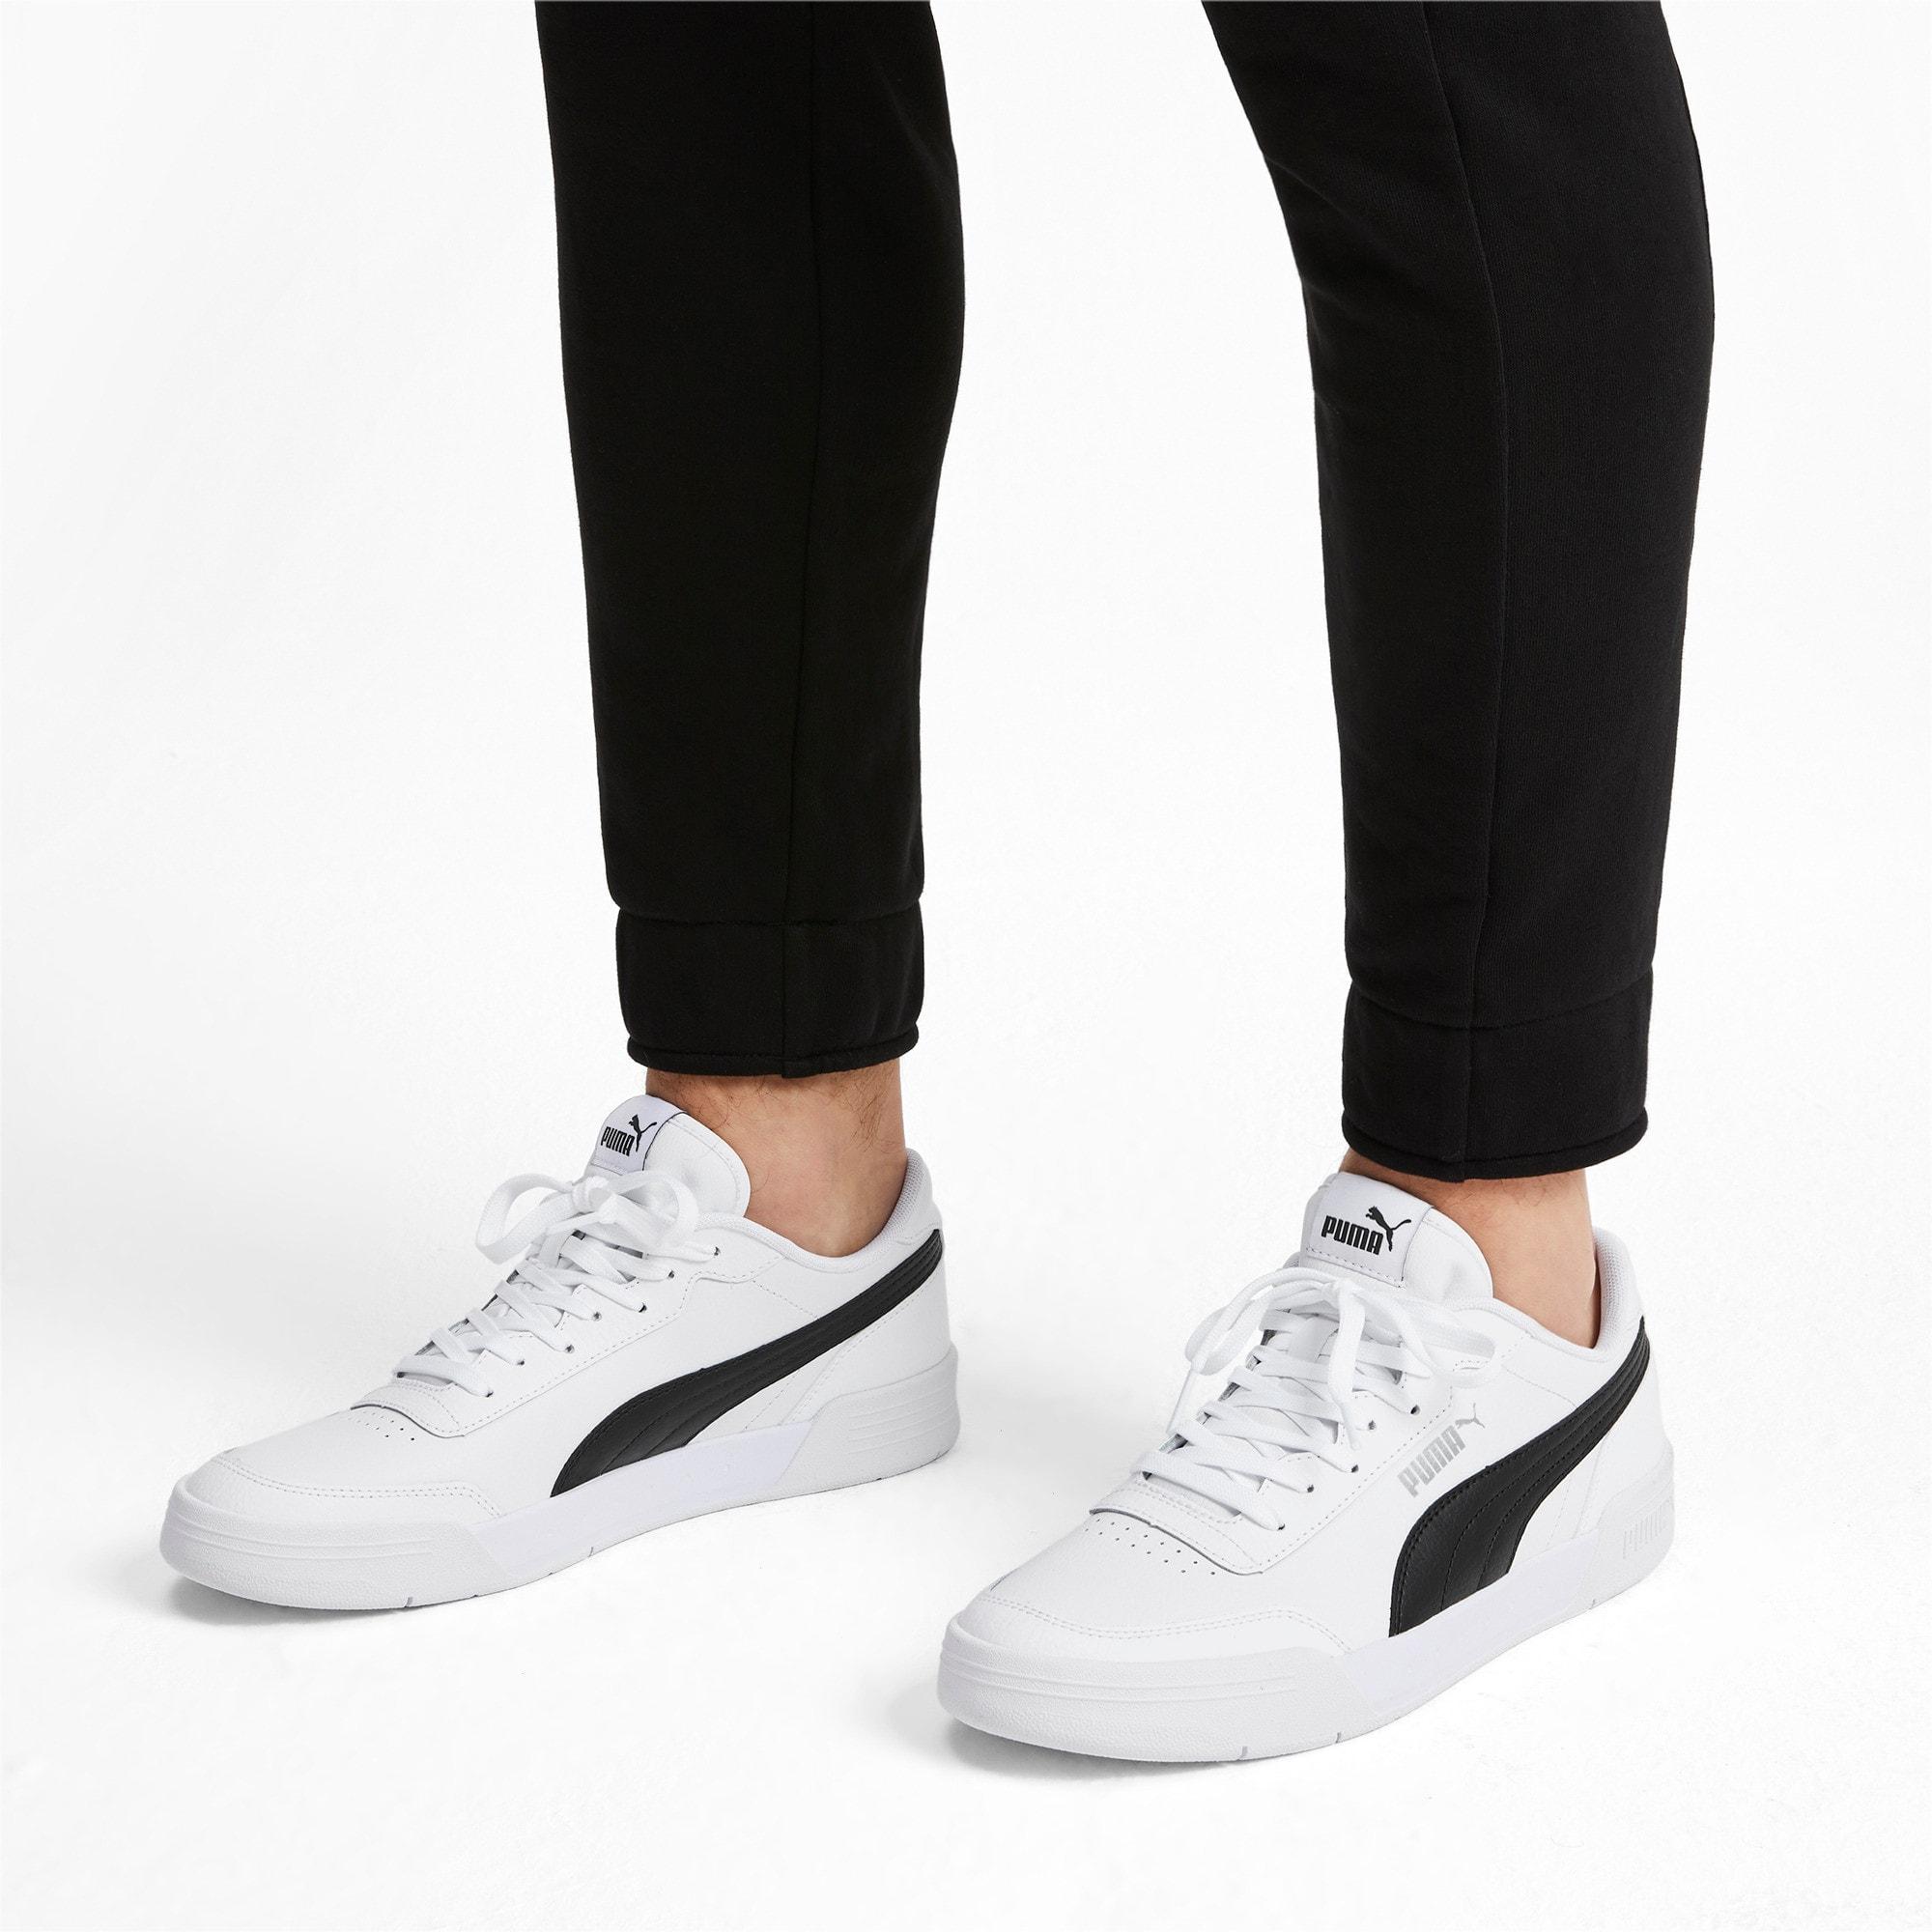 Thumbnail 2 of Caracal Sneakers, Puma White-Puma Black, medium